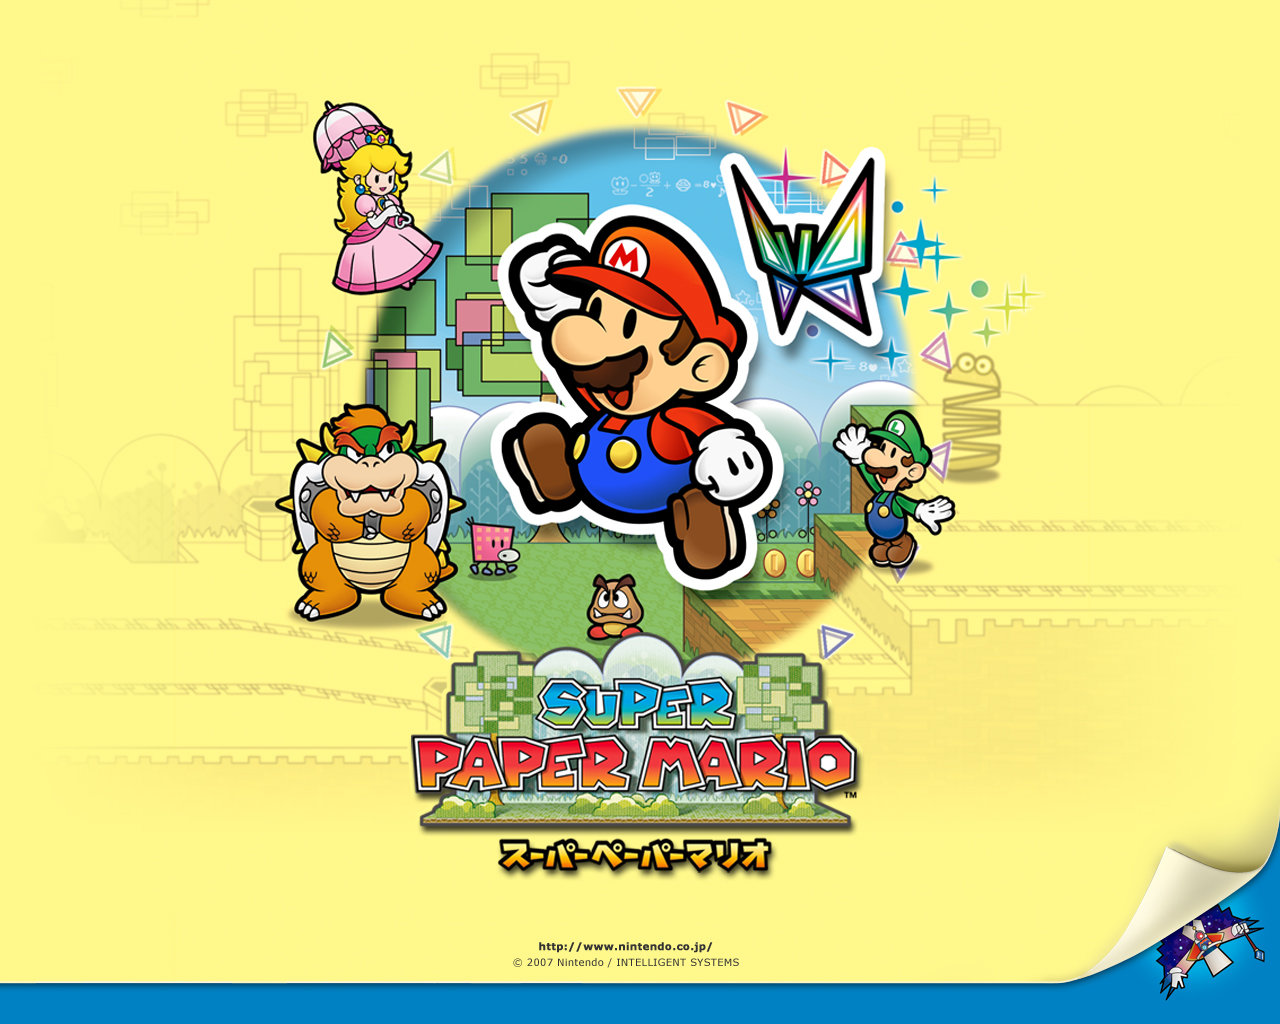 Super Paper Mario Wallpapers Hd For Desktop Backgrounds